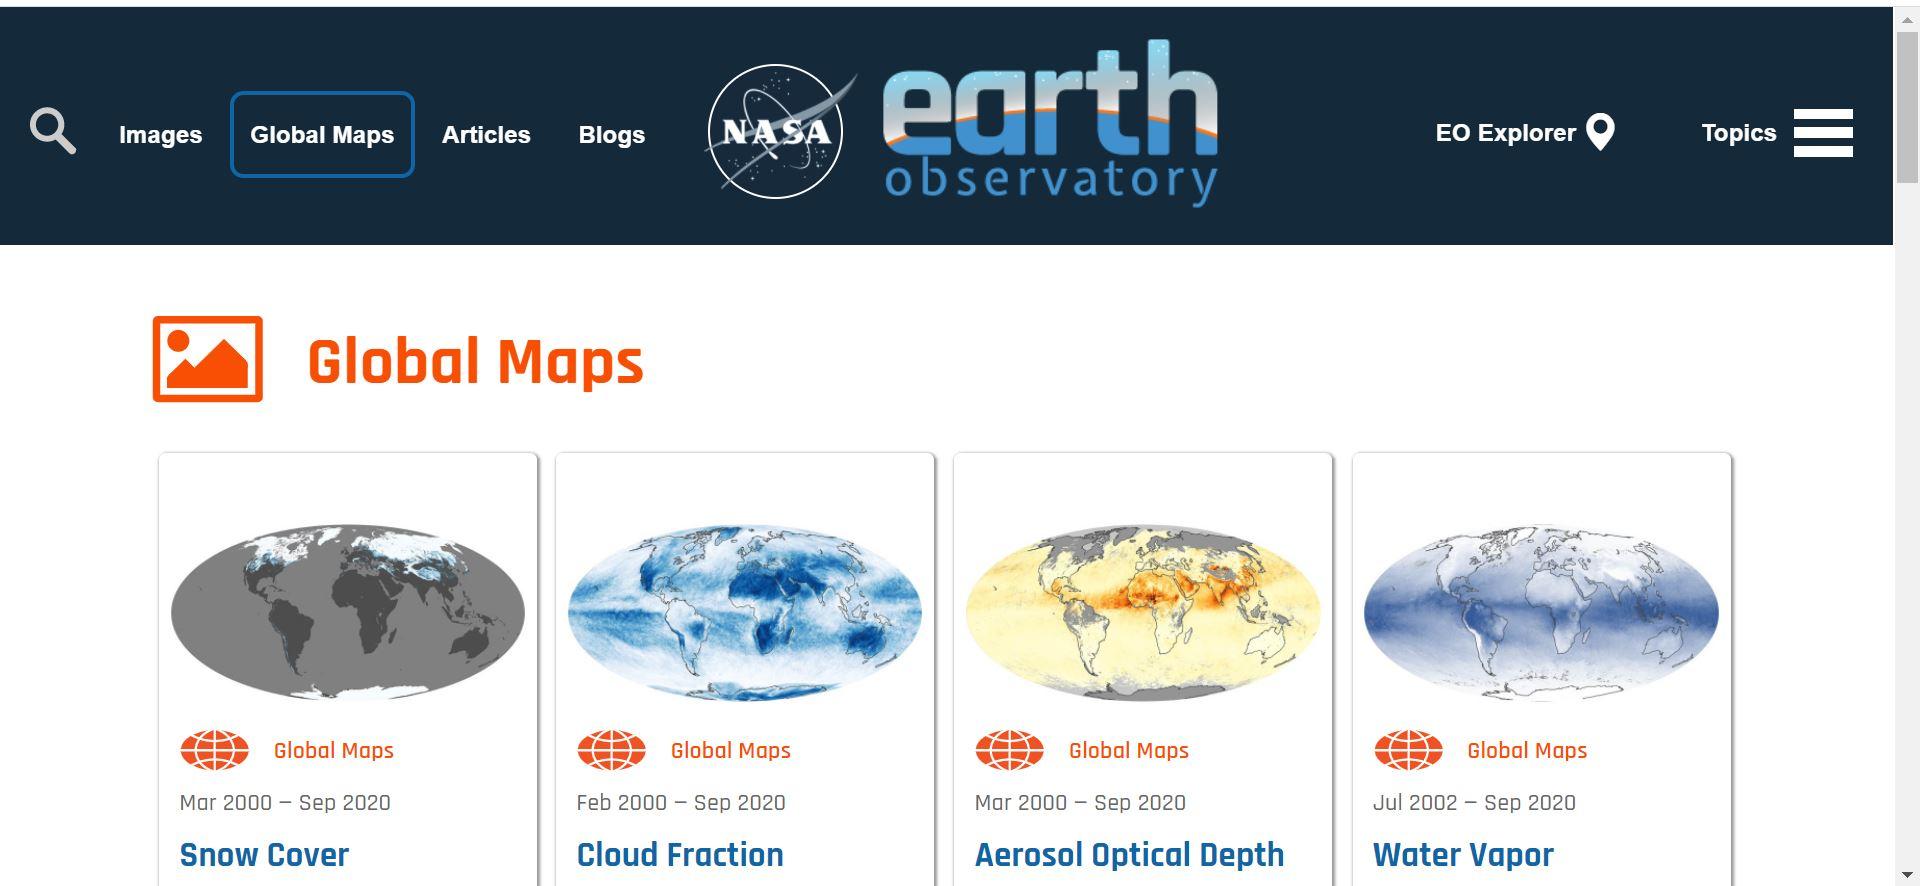 سایت NASA Earth Observatory